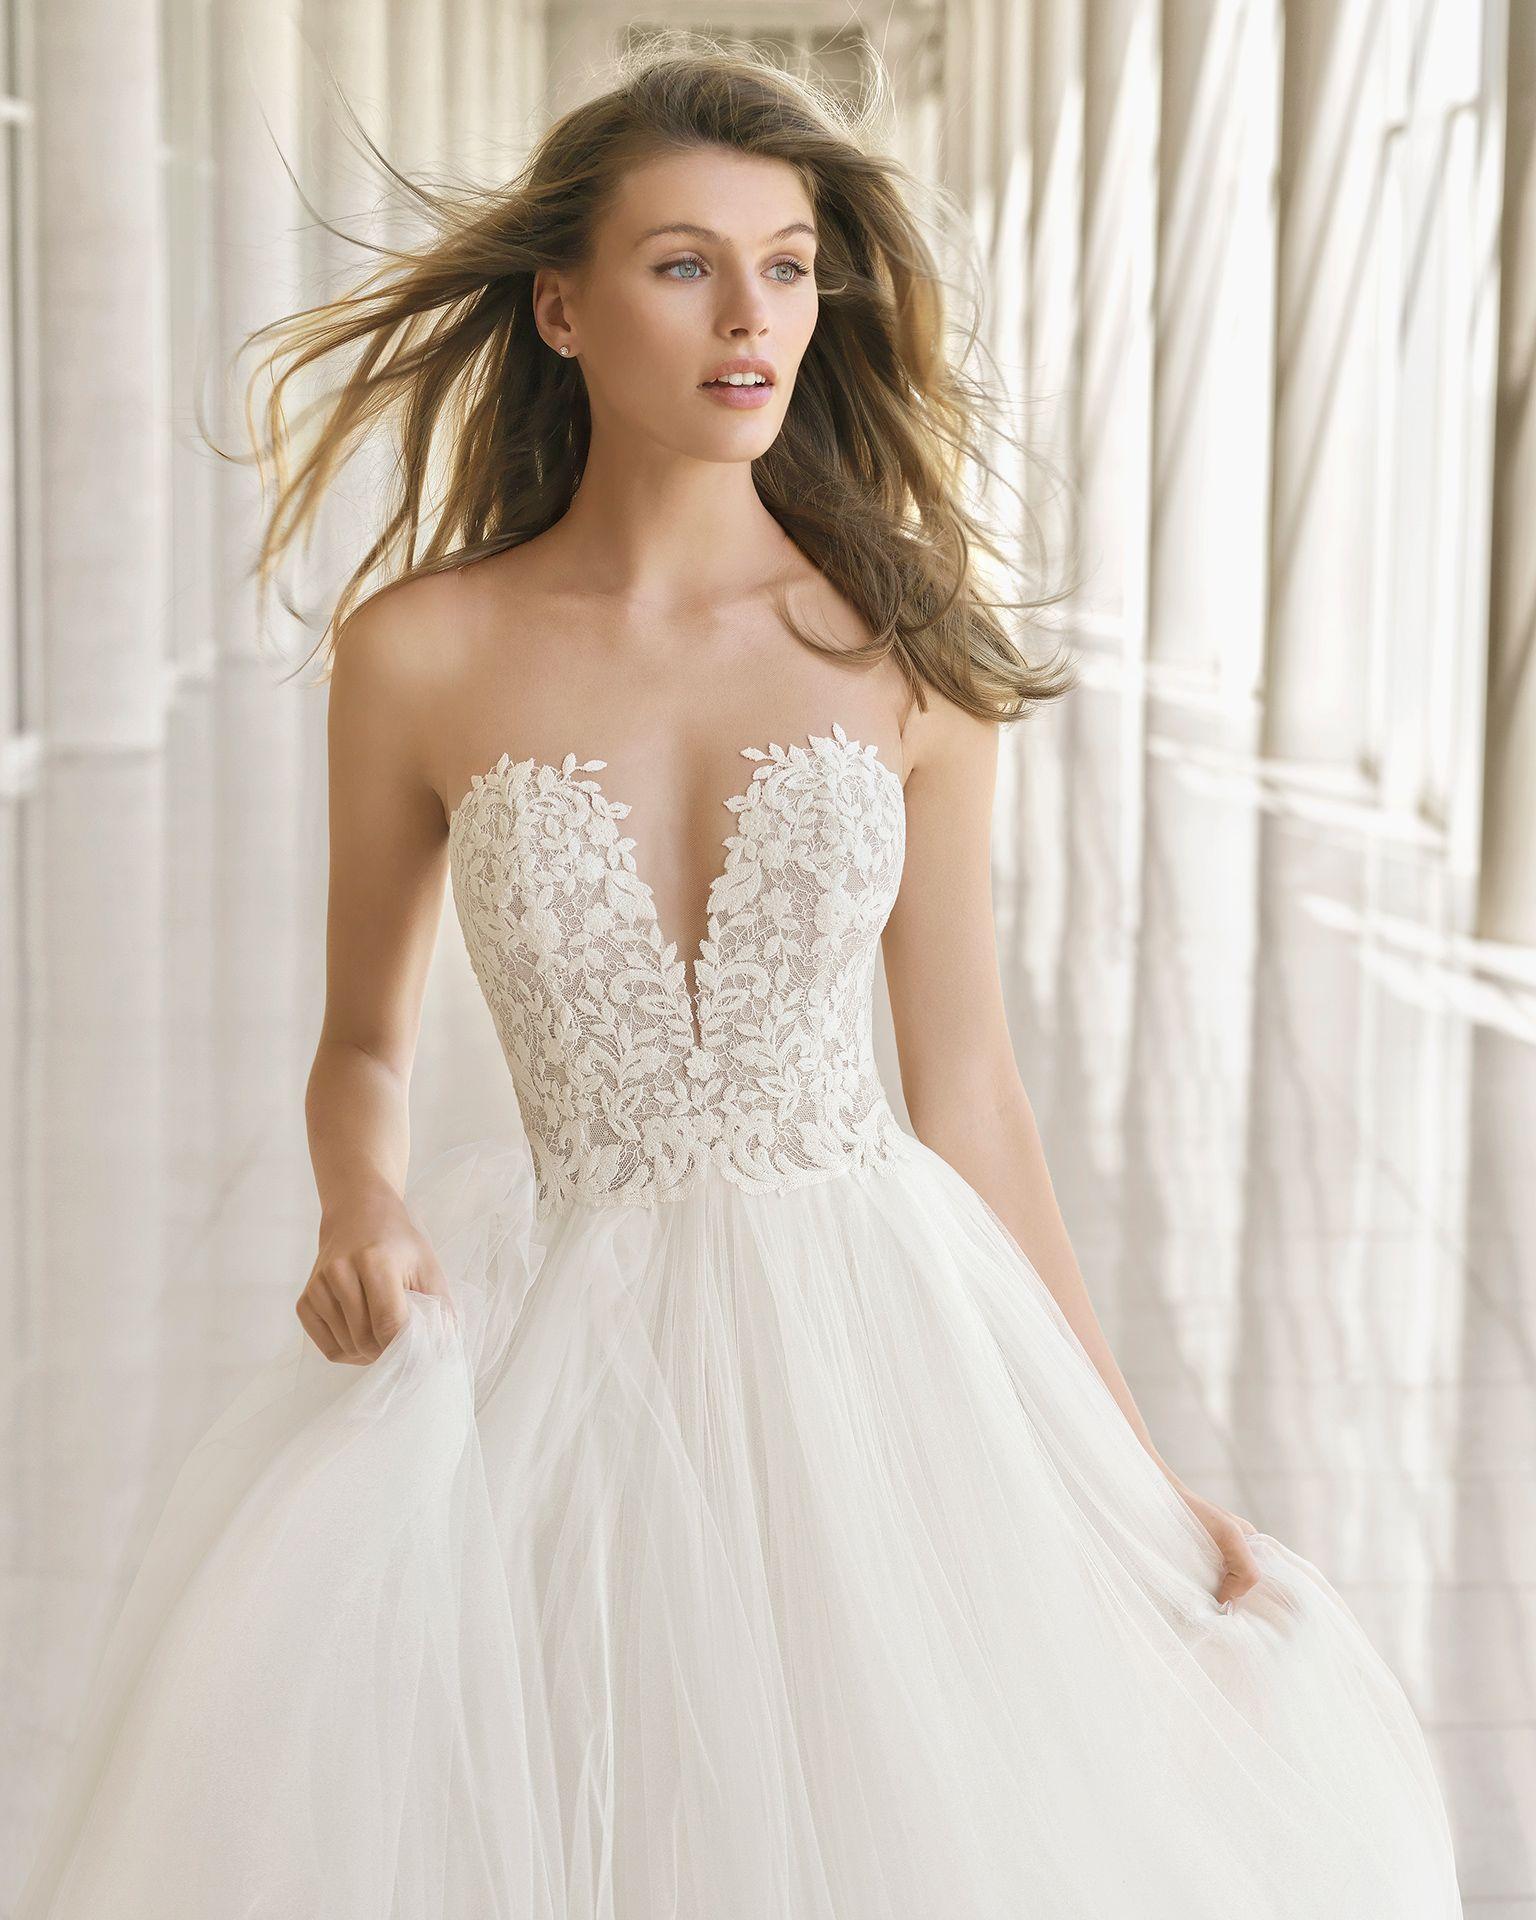 2018_POETA_ROSA_CLARA_COUTURE_2.jpg (1536×1920) | Wedding dress2 ...